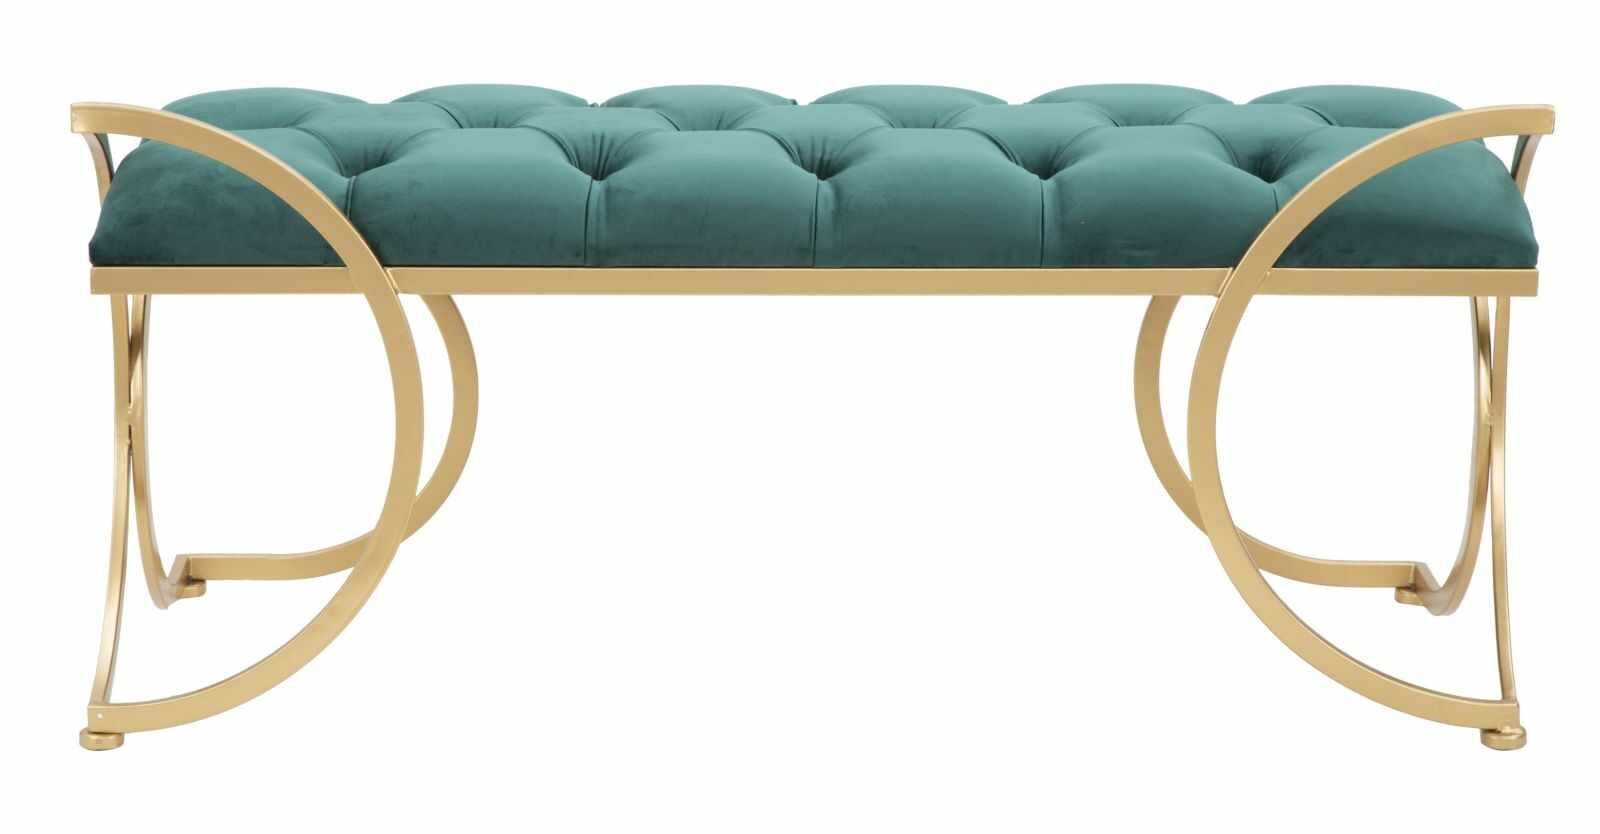 Banca tapitata cu stofa si picioare metalice Luxy Velvet Verde / Auriu, l103xA43xH47 cm la pret 1105 lei